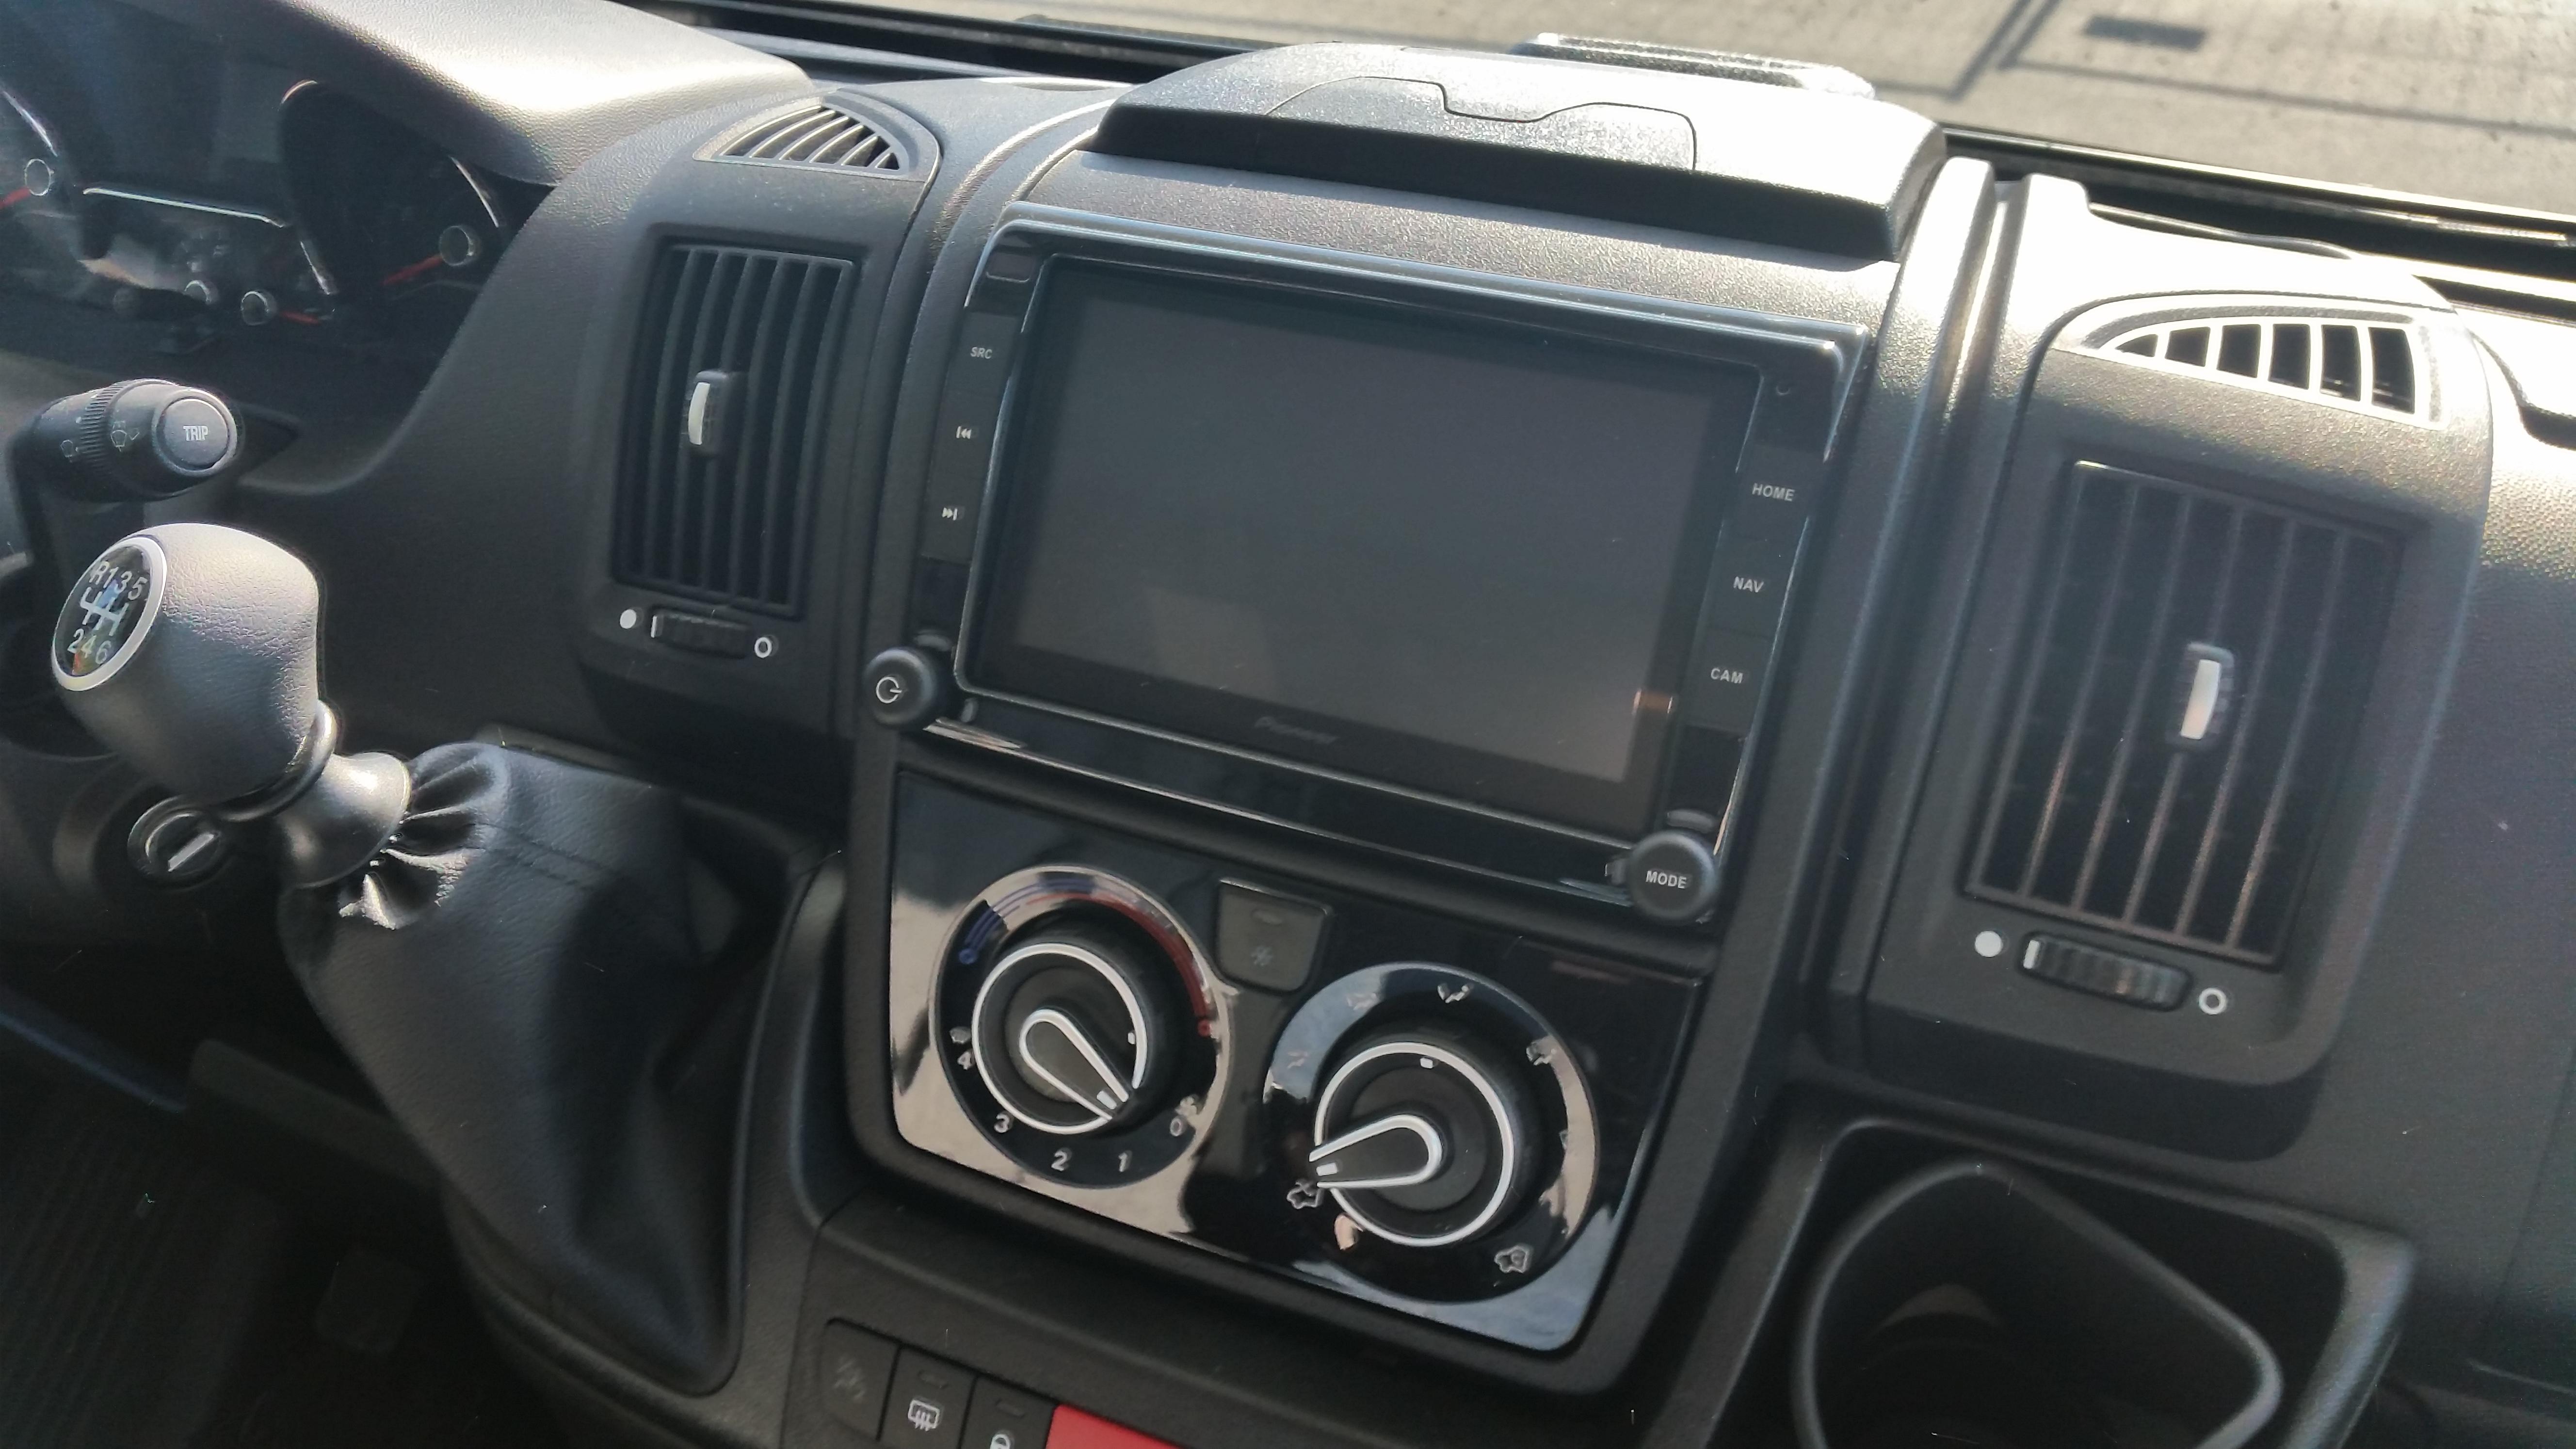 Fahrerhaus Bildschirm